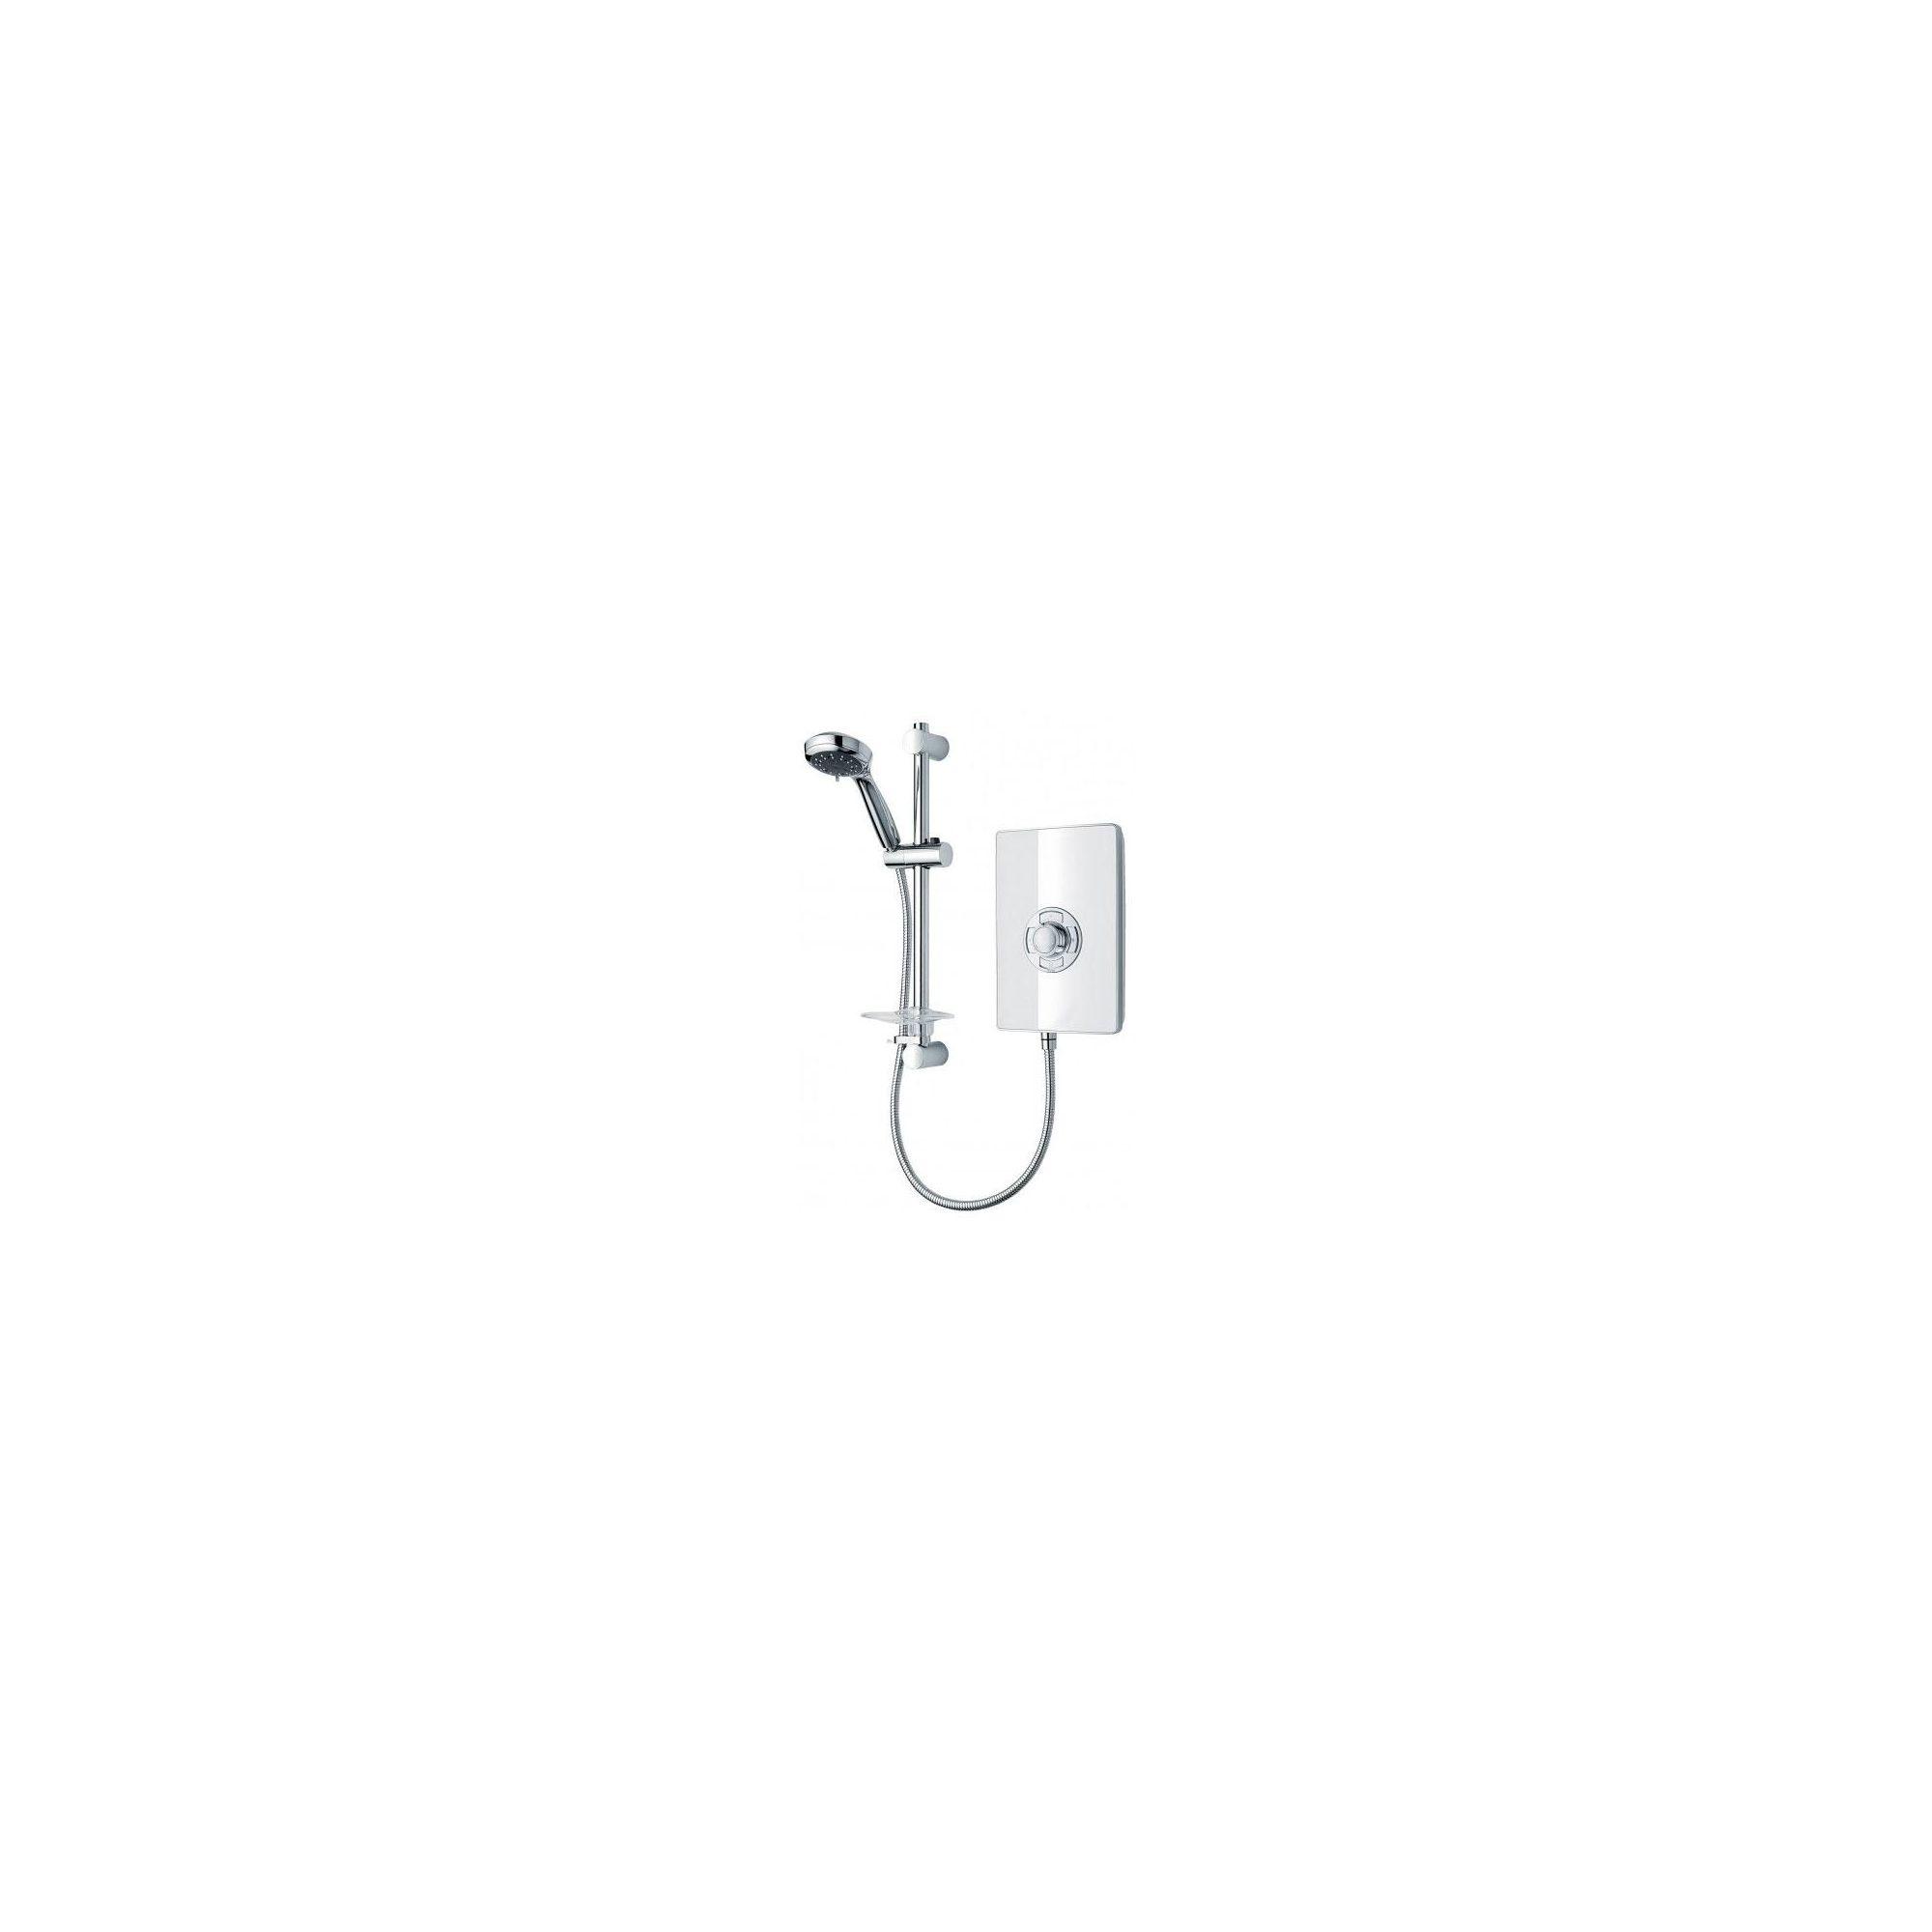 Triton Aspirante Electric Shower White Gloss 8.5 kW at Tescos Direct